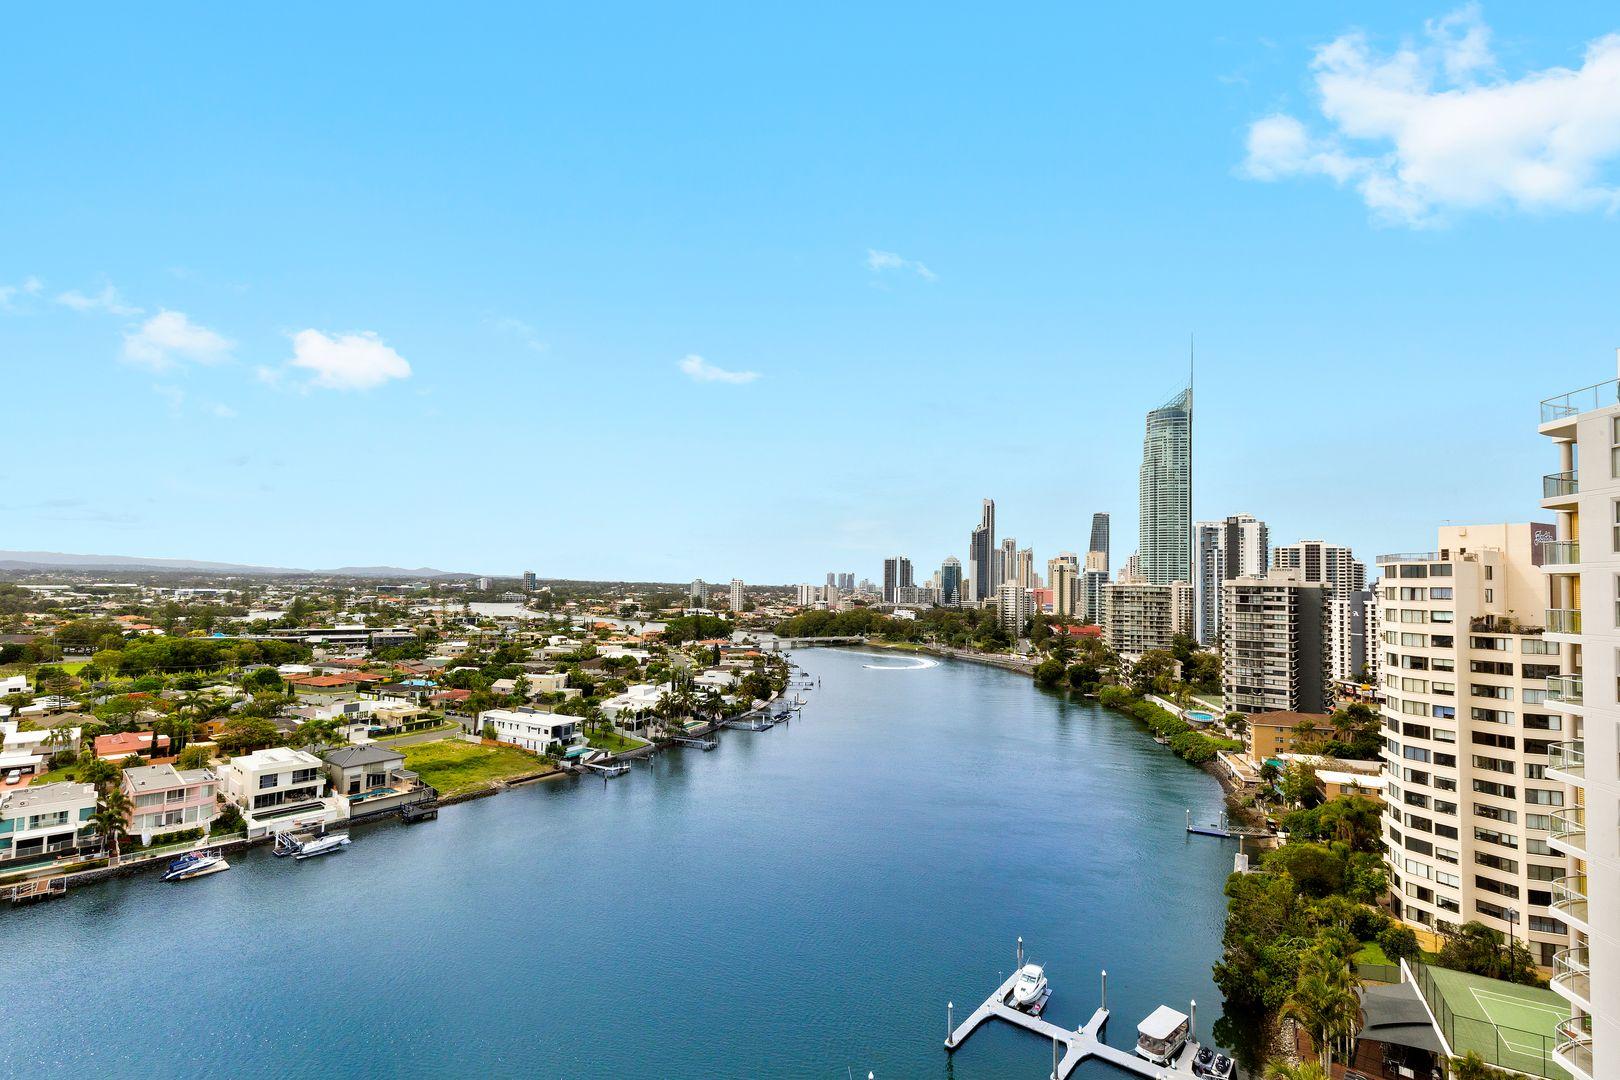 63/2890 Gold Coast Highway, Surfers Paradise QLD 4217, Image 1